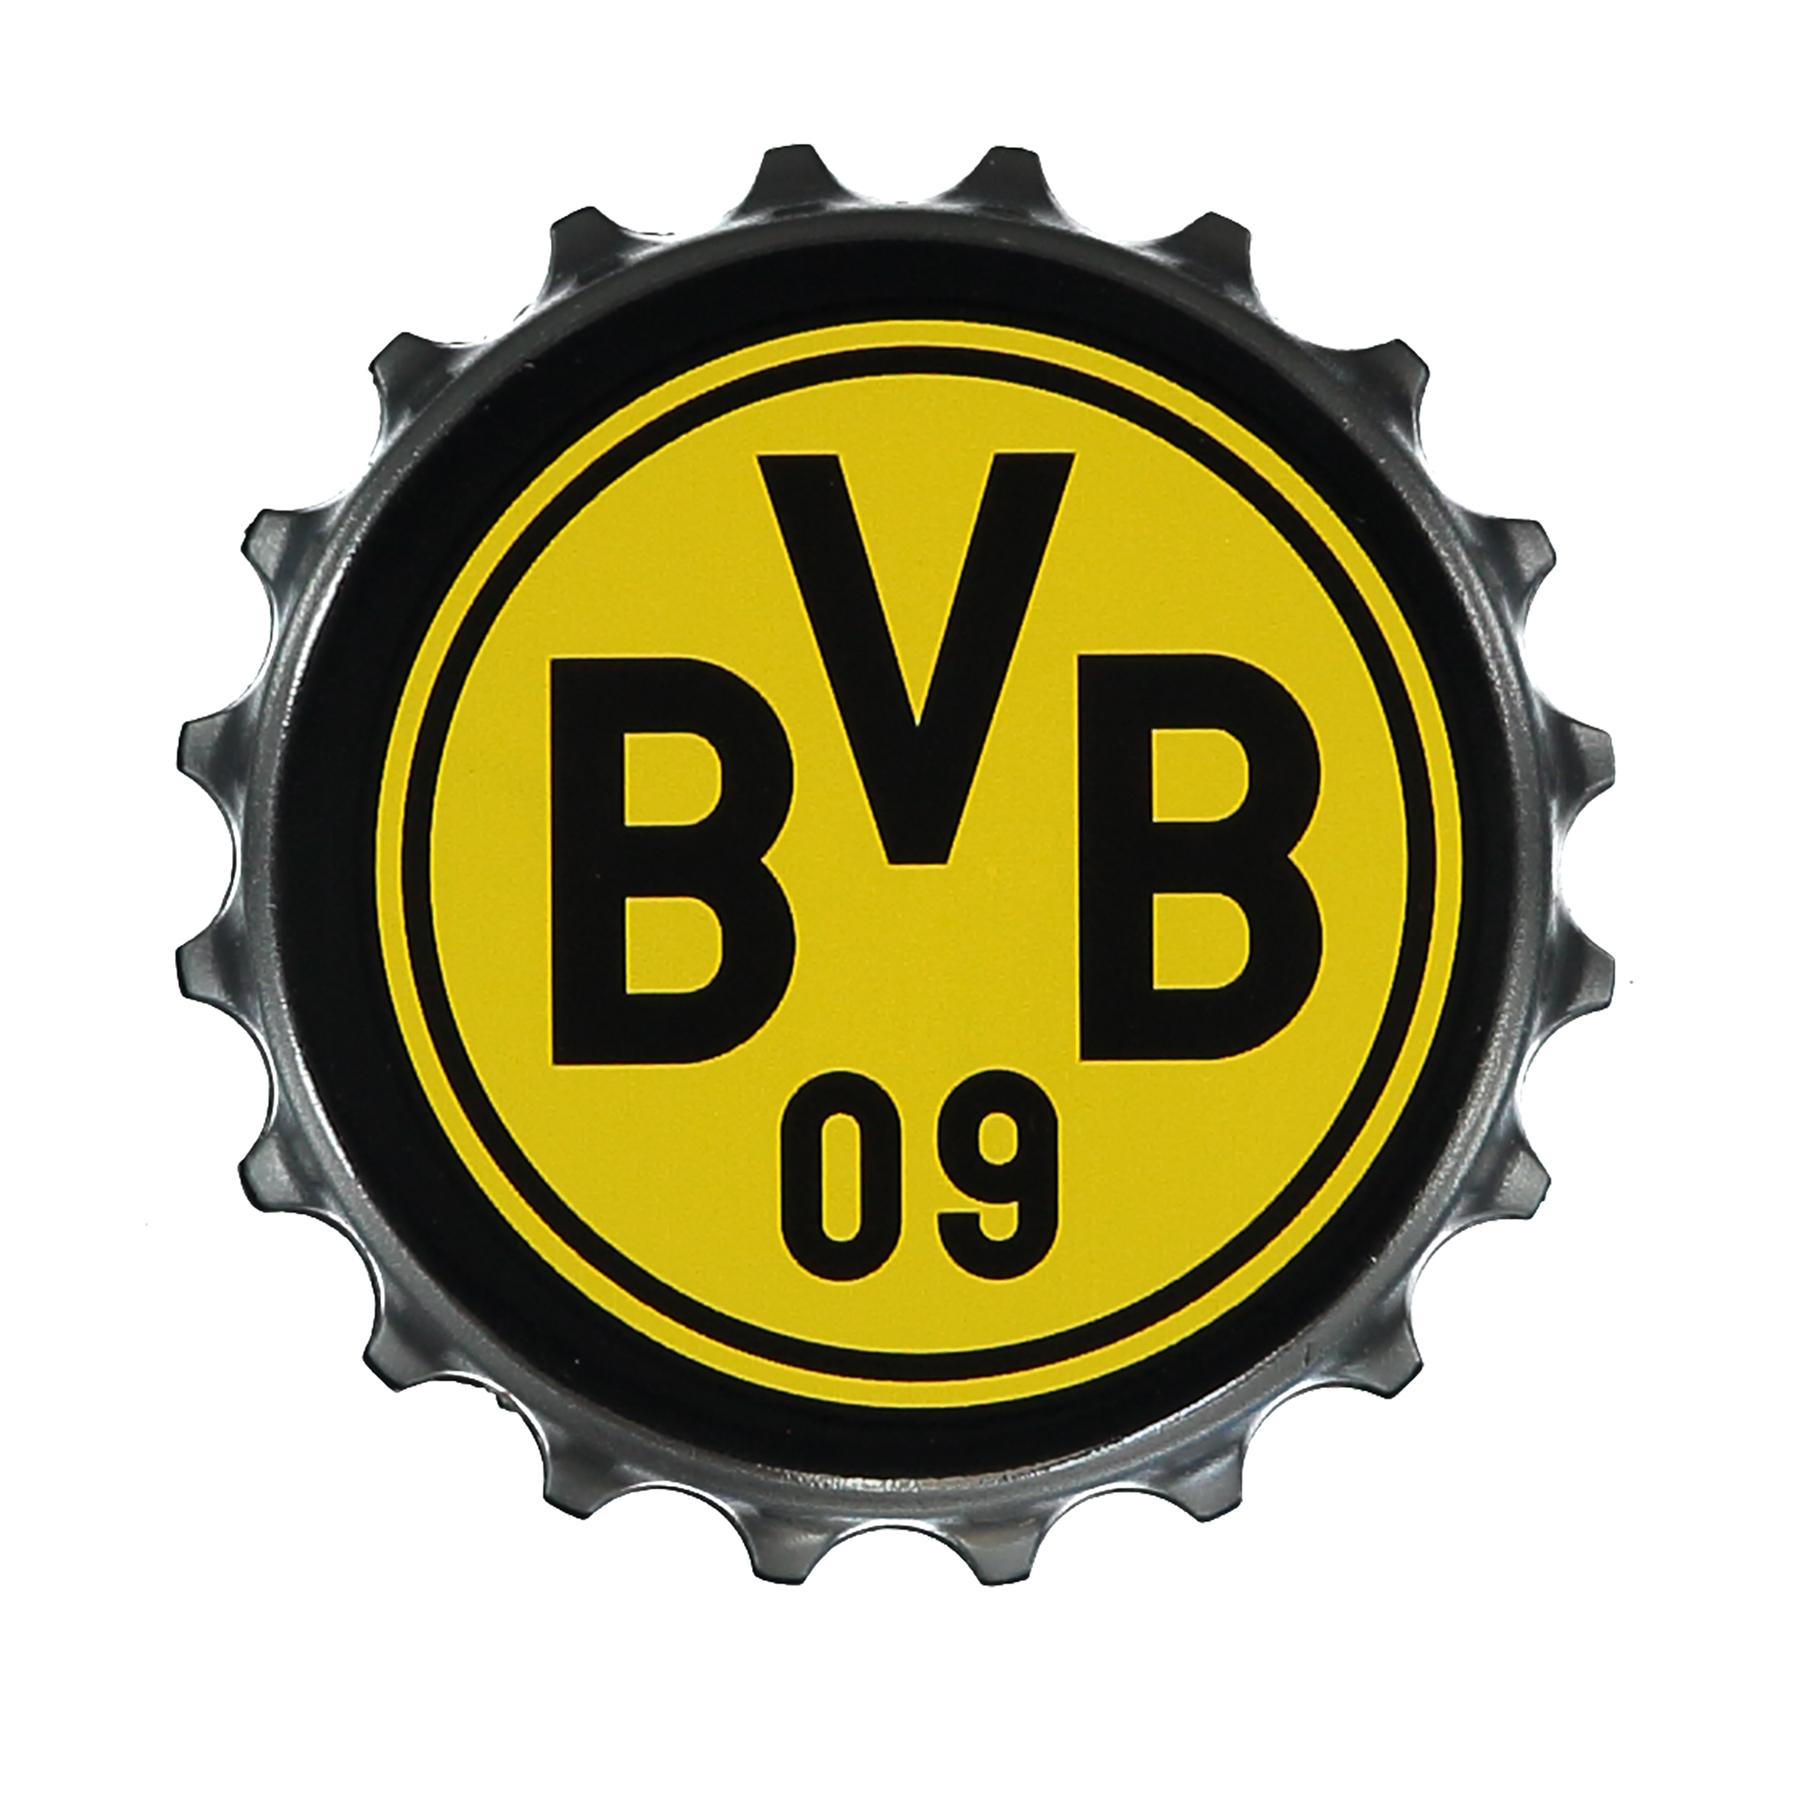 Image of BVB Magentic Bottle Opener